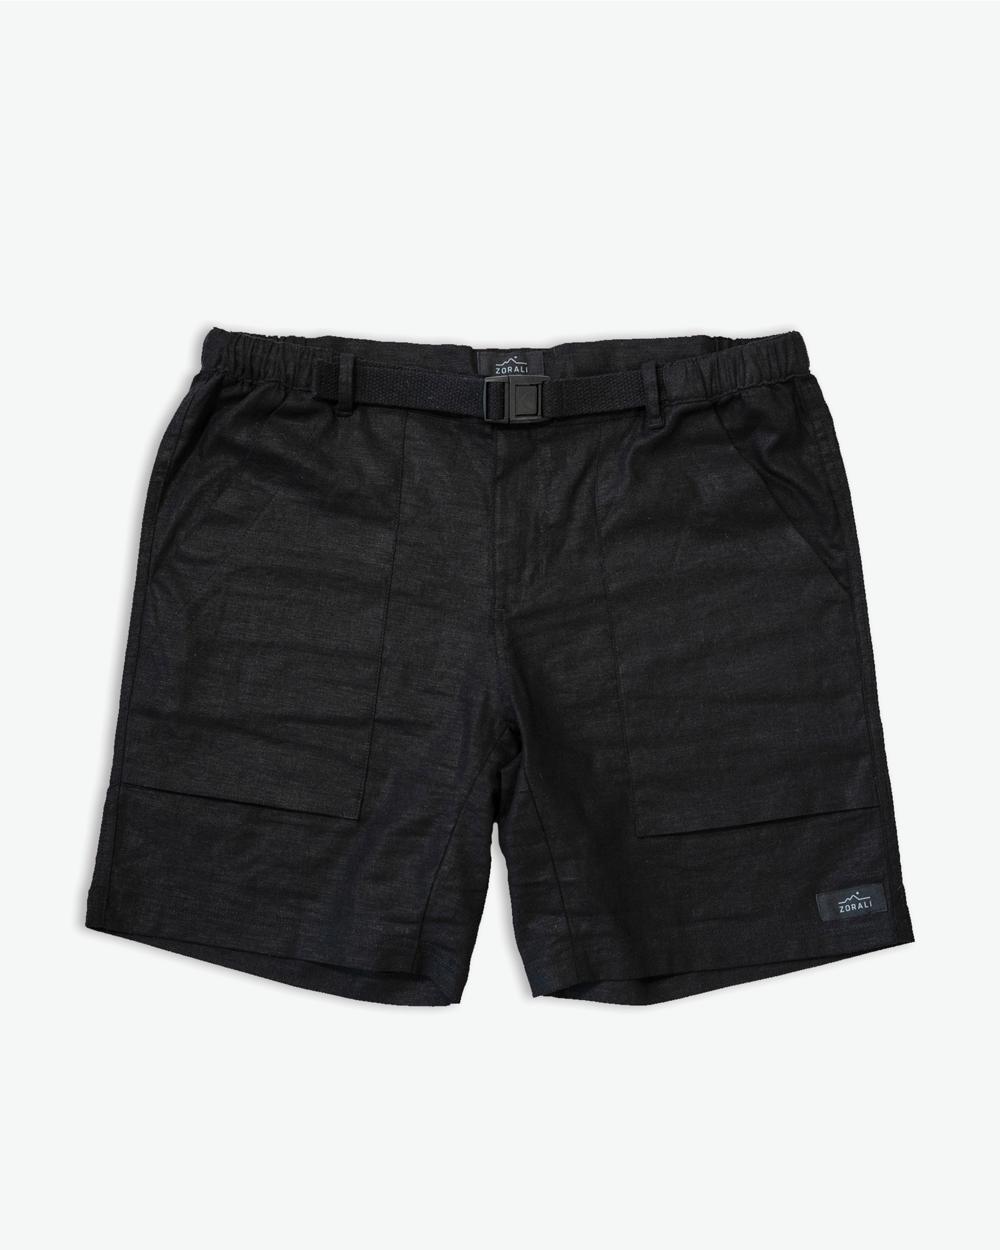 Zorali-Hemp-Shorts-Black.png